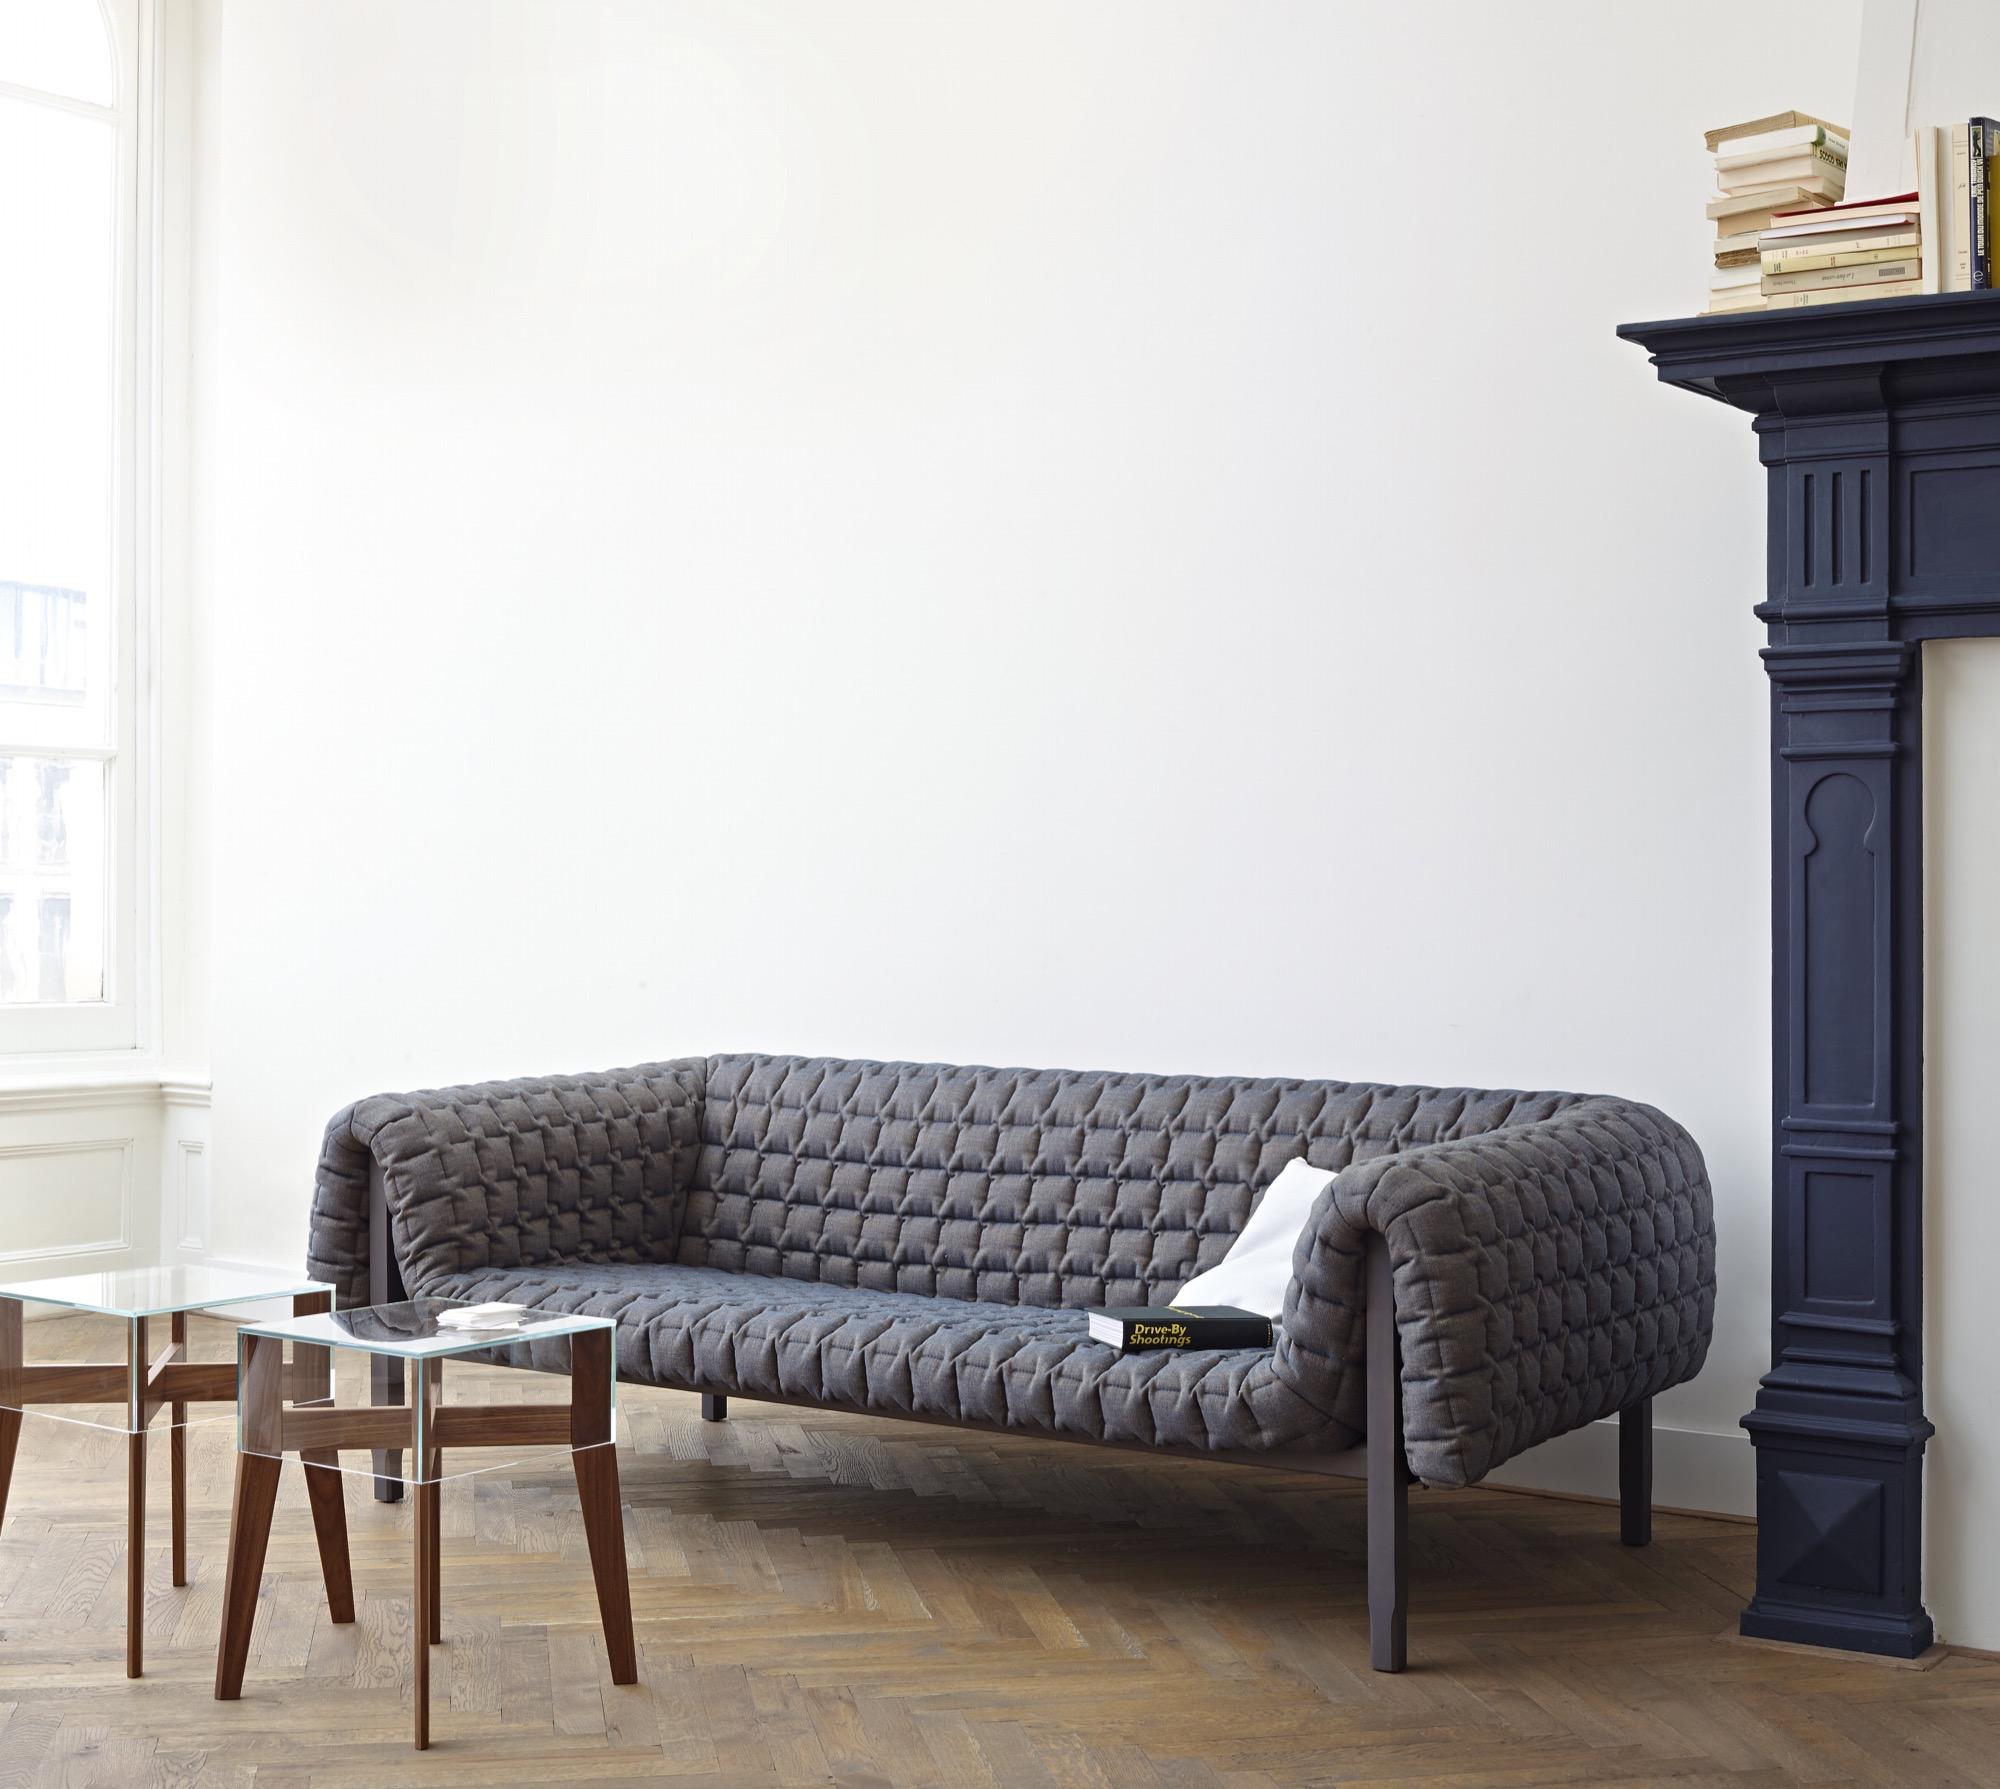 Ruché sofa by Ligne Roset